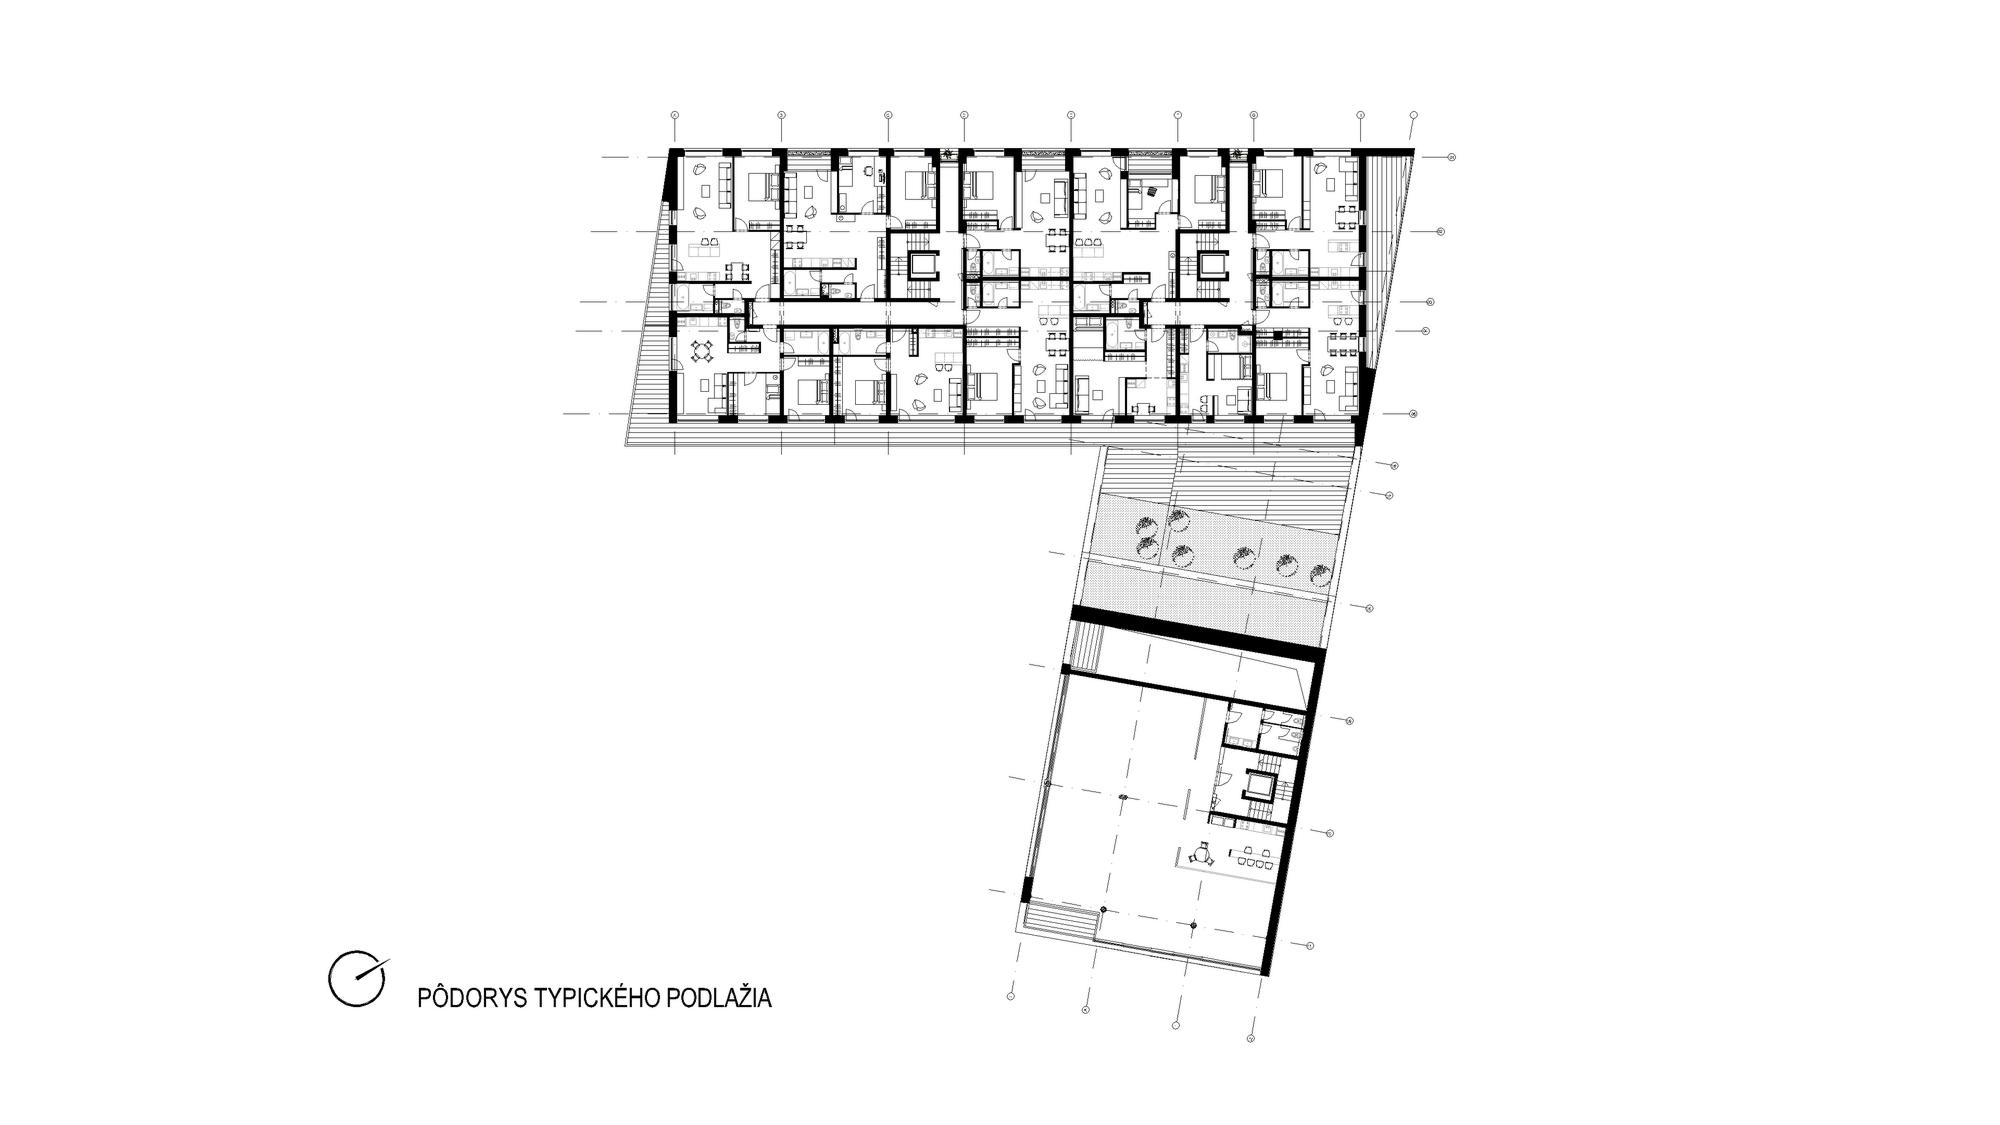 polyfunkcny-bytovy-dom-colorhouse-2-novostavba-topolcany-podorys-typickeho-podlazia